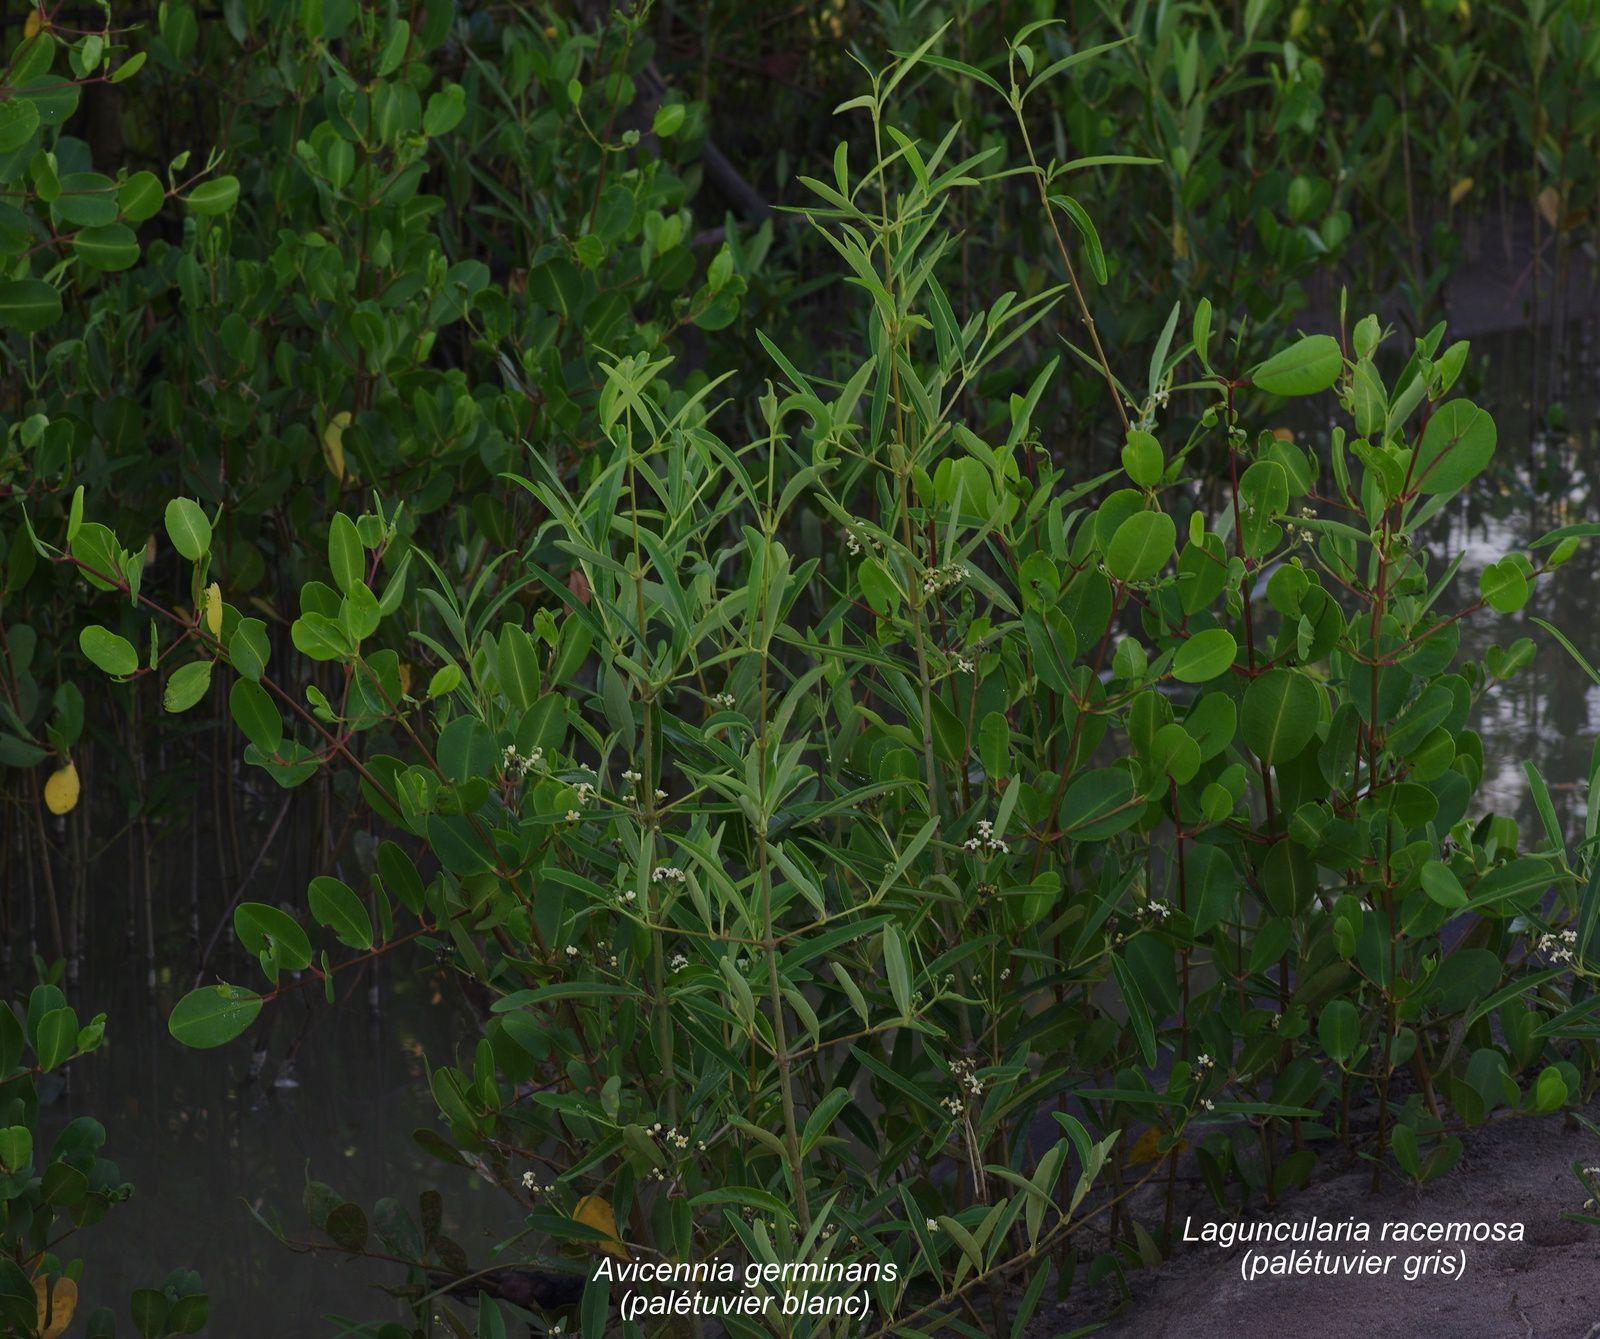 Laguncularia racemosa (palétuvier gris)